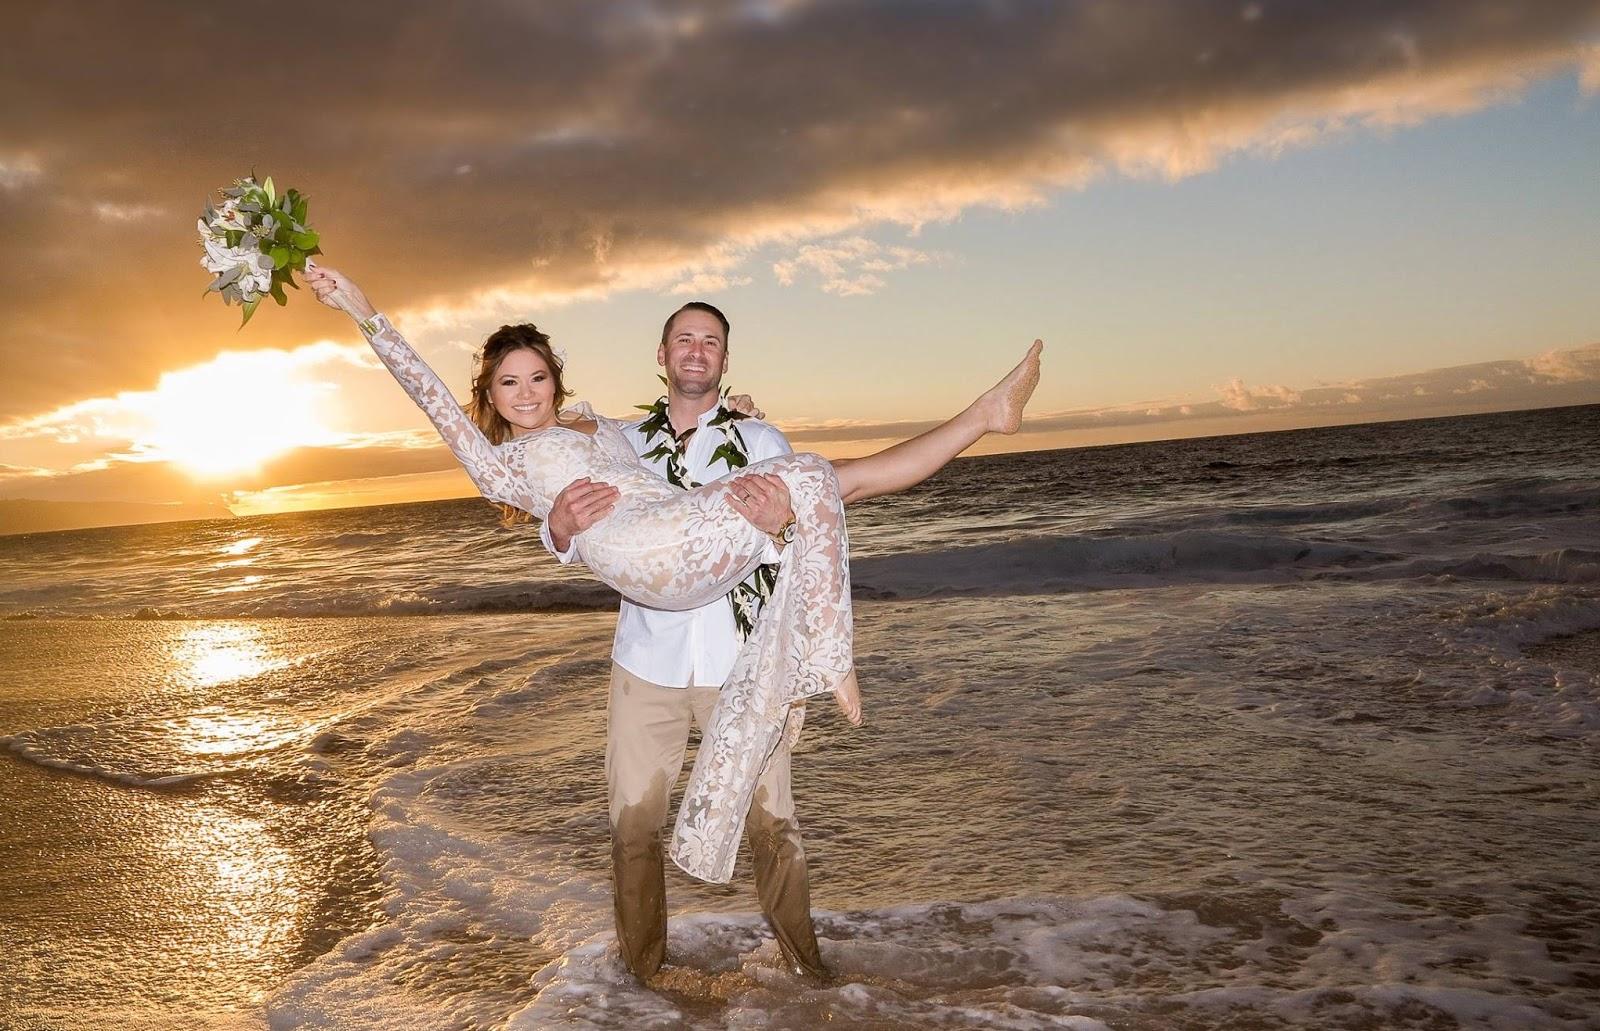 7 Tips to Plan a Successful Beach Wedding in Hawaii